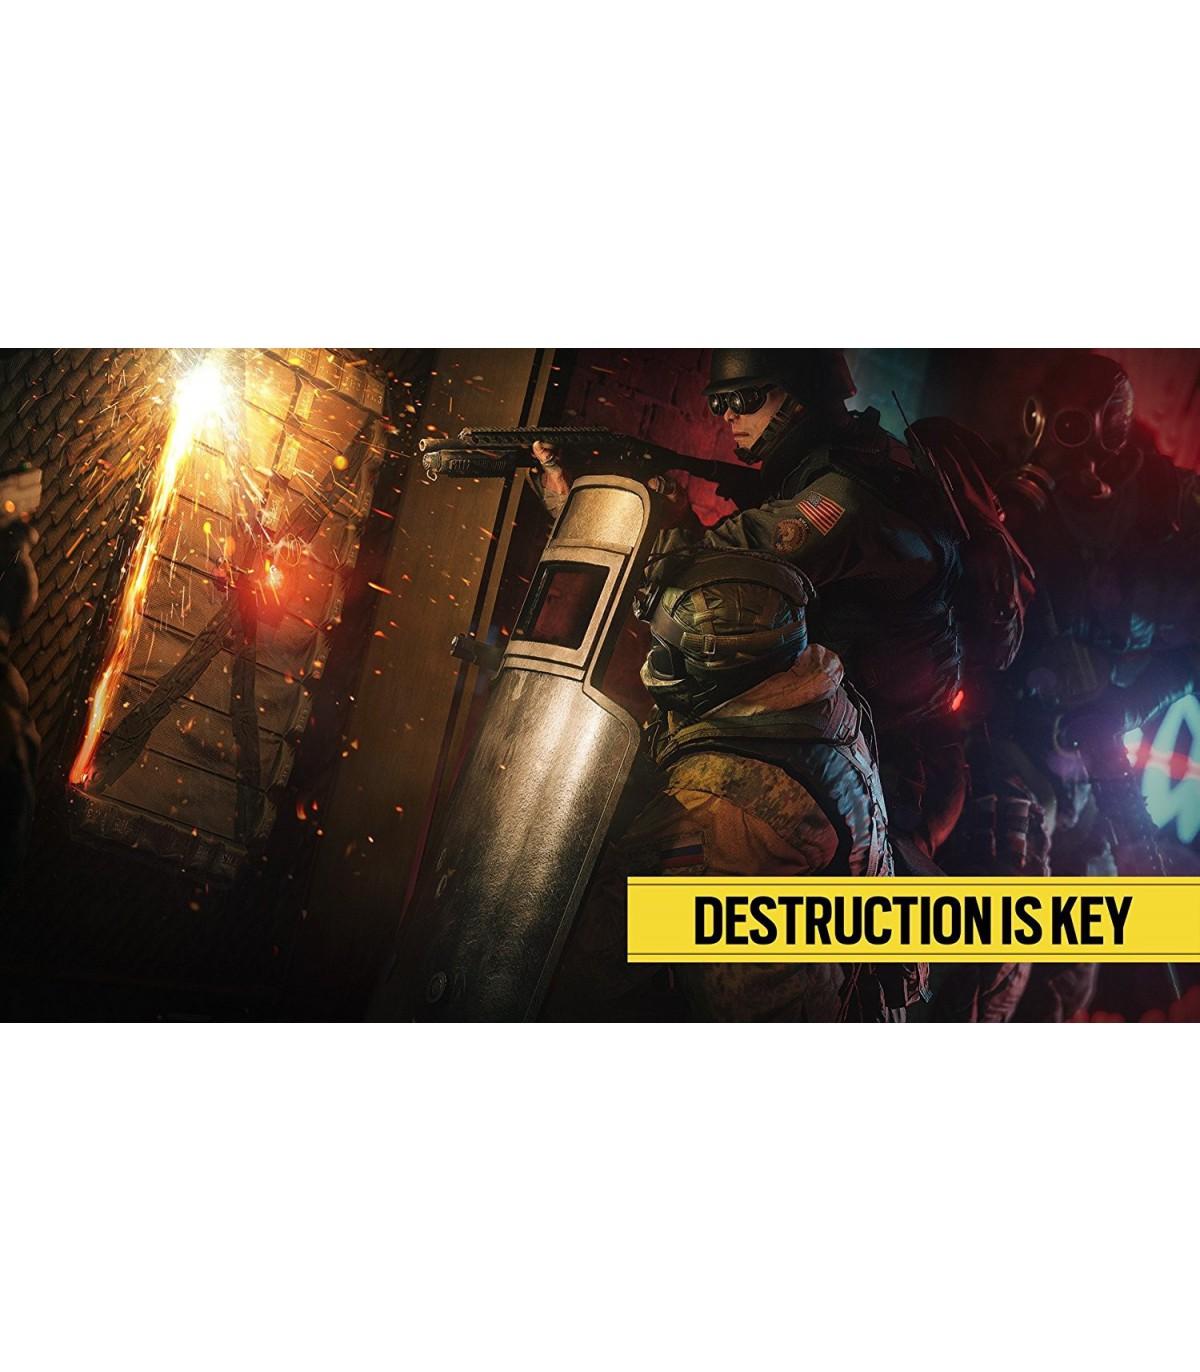 بازی  Tom Clancy's The Division + Rainbow Six Siege Double Pack - پلی استیشن 4